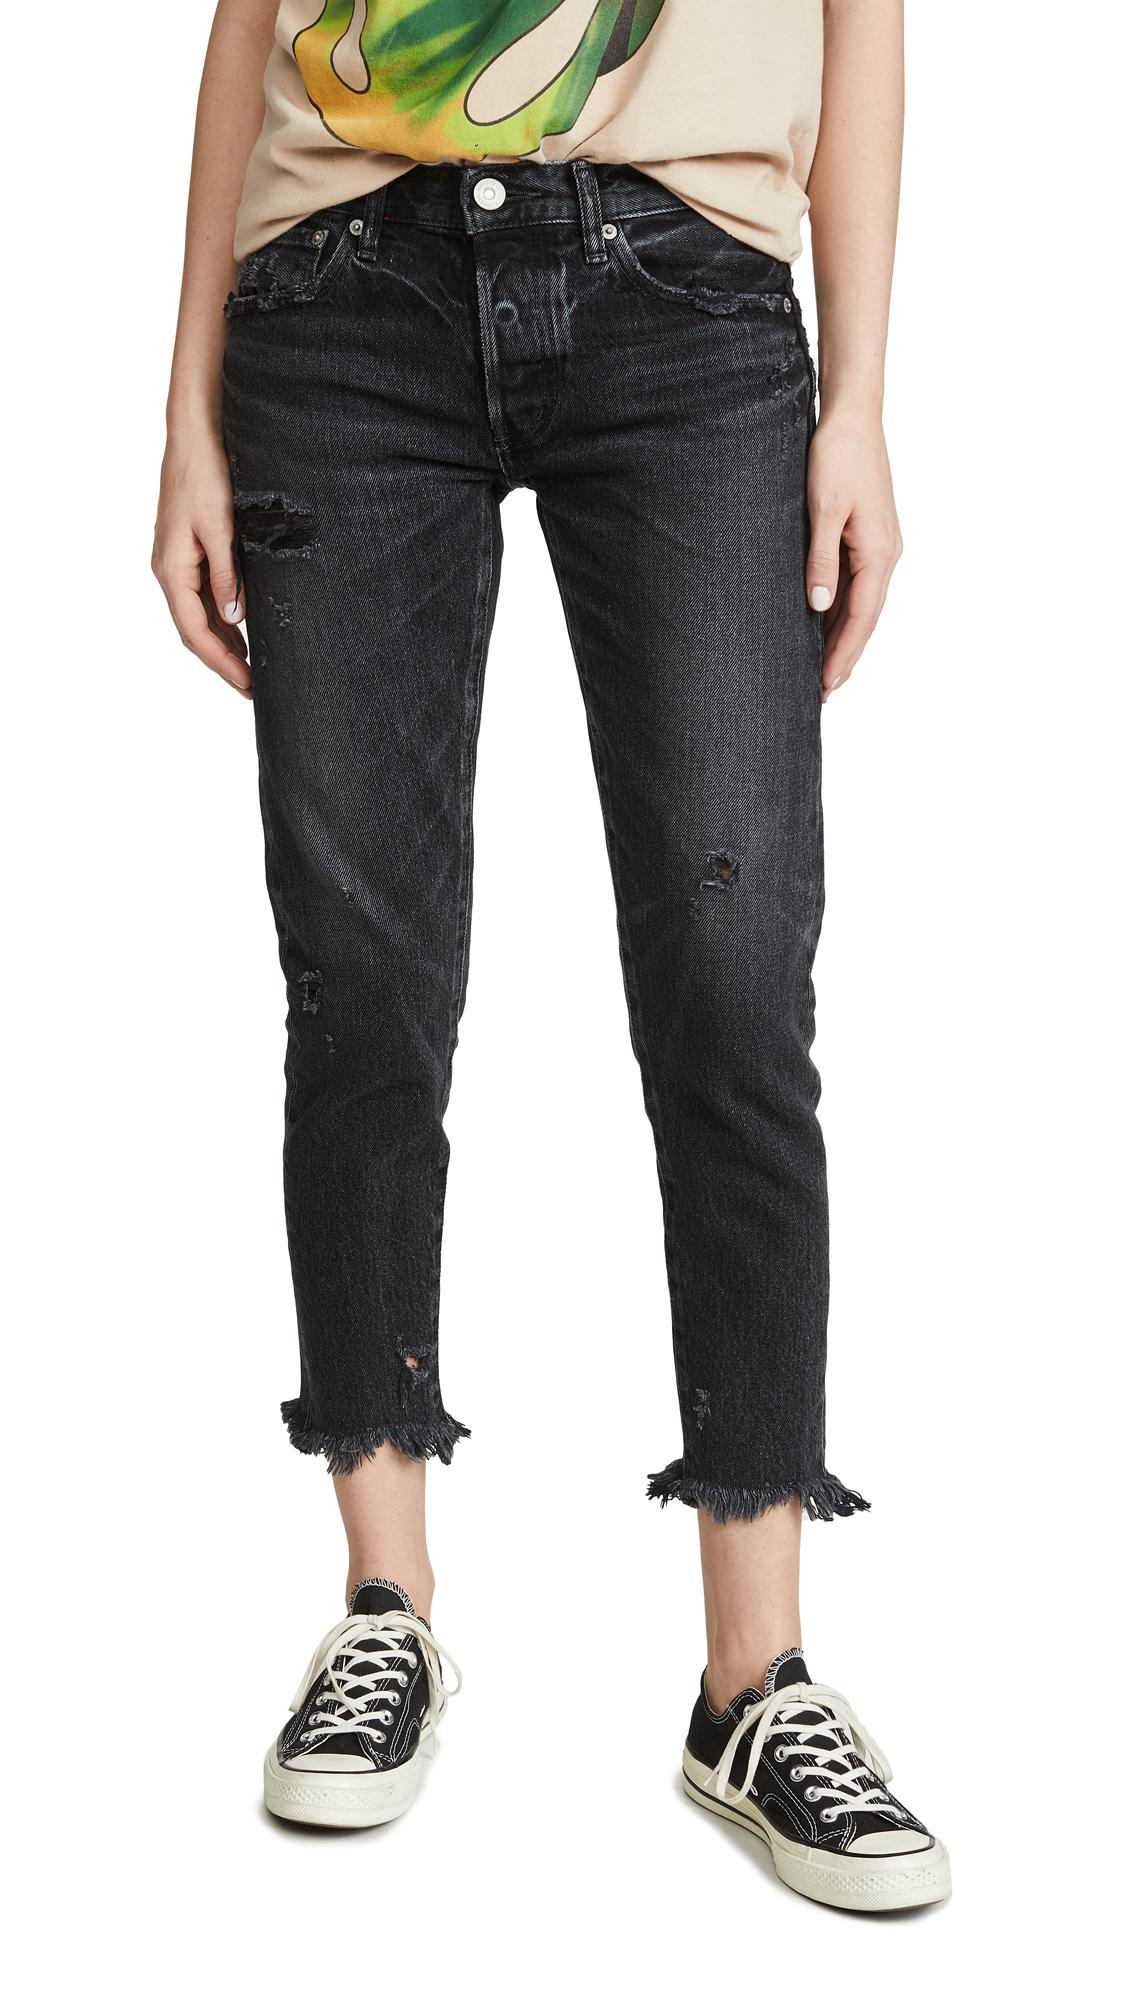 MOUSSY VINTAGE MV Kelley Tapered Jeans - Black